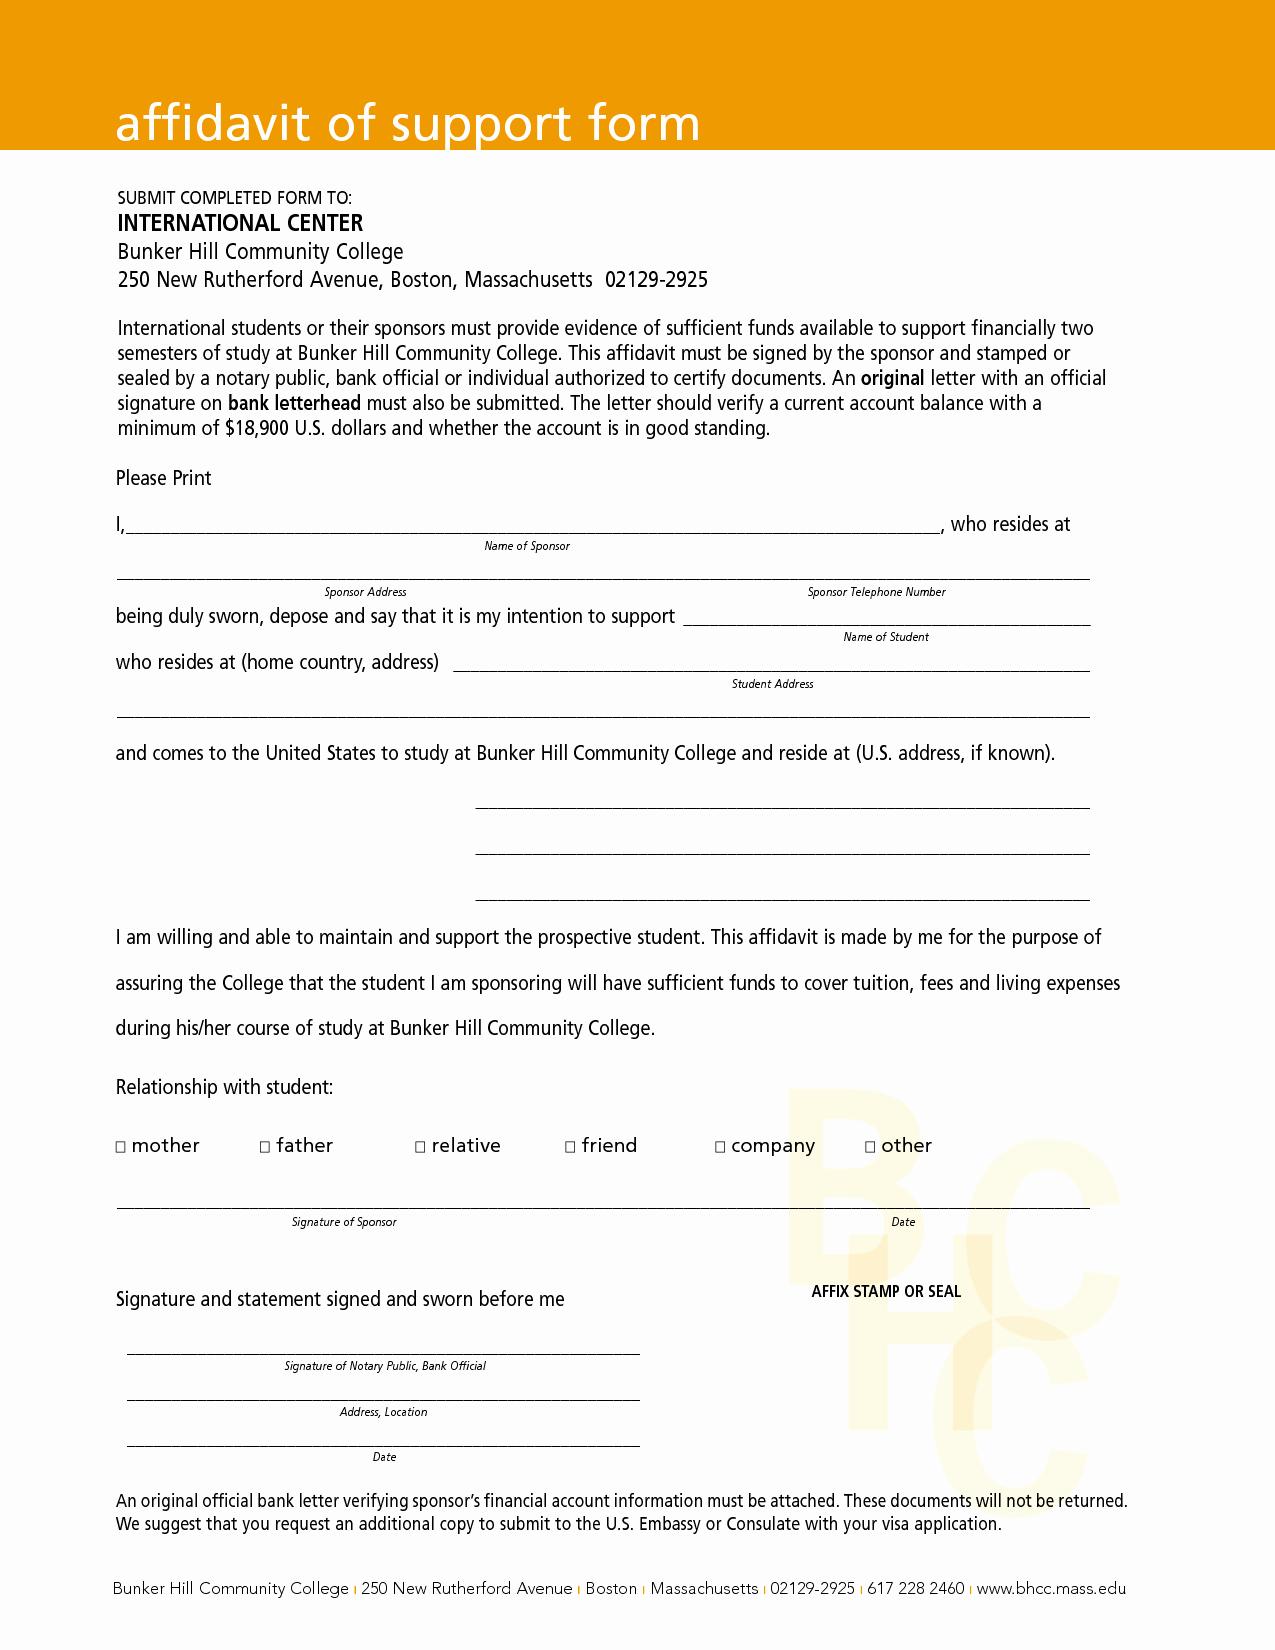 Affidavit Of Support Template Fresh Free Download Affidavit Of Support form with orange Header